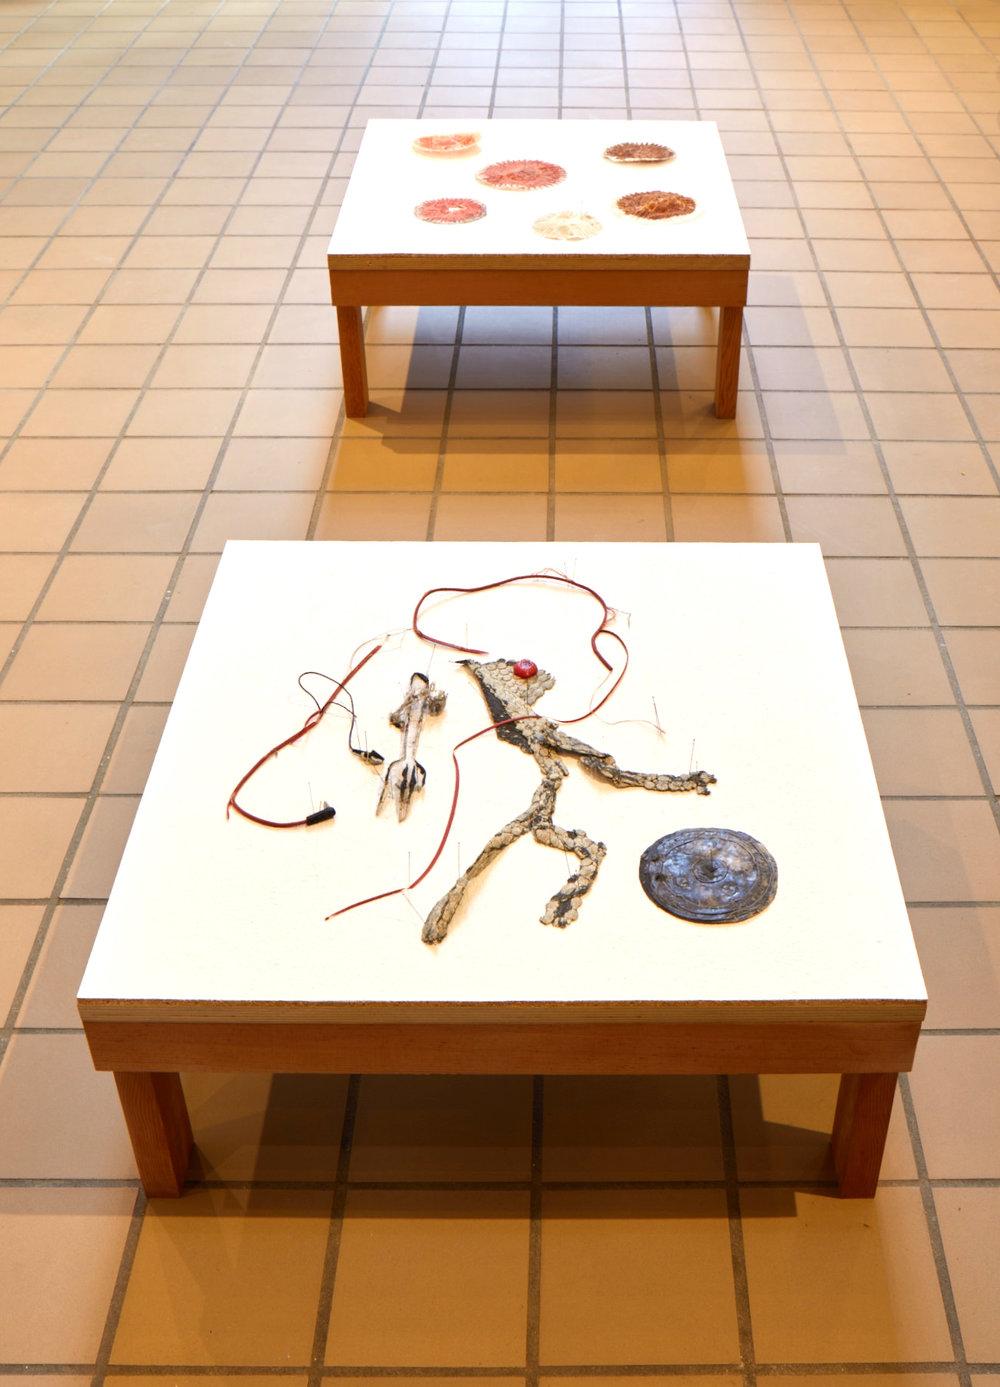 Installation view of  Material History  at JDJ, Garrison, NY, 2019